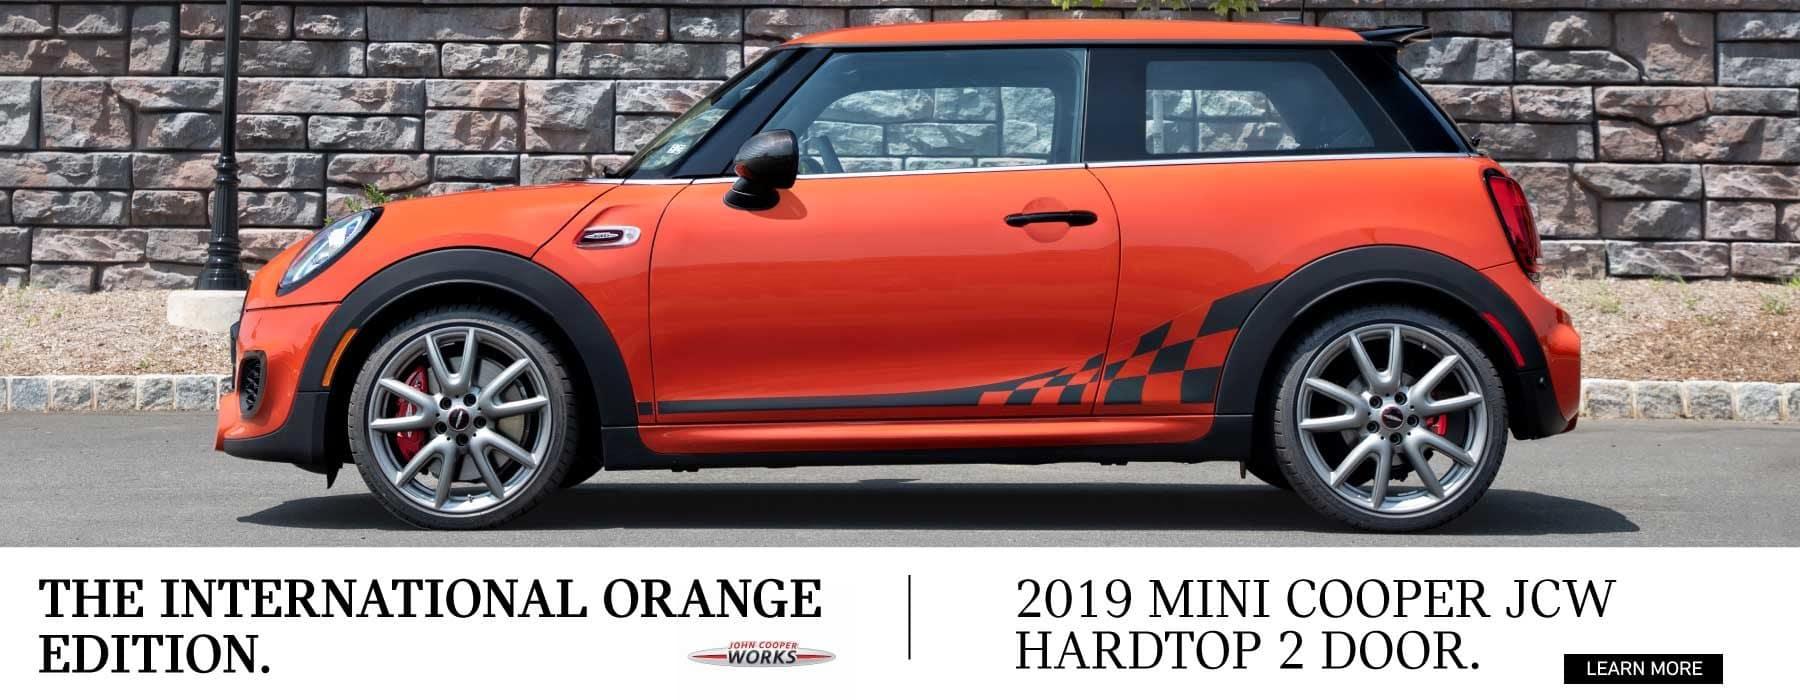 Baron Mini And Used Car Dealer In Merriam Ks Cooper Remote Starter Diagram New Vehicles